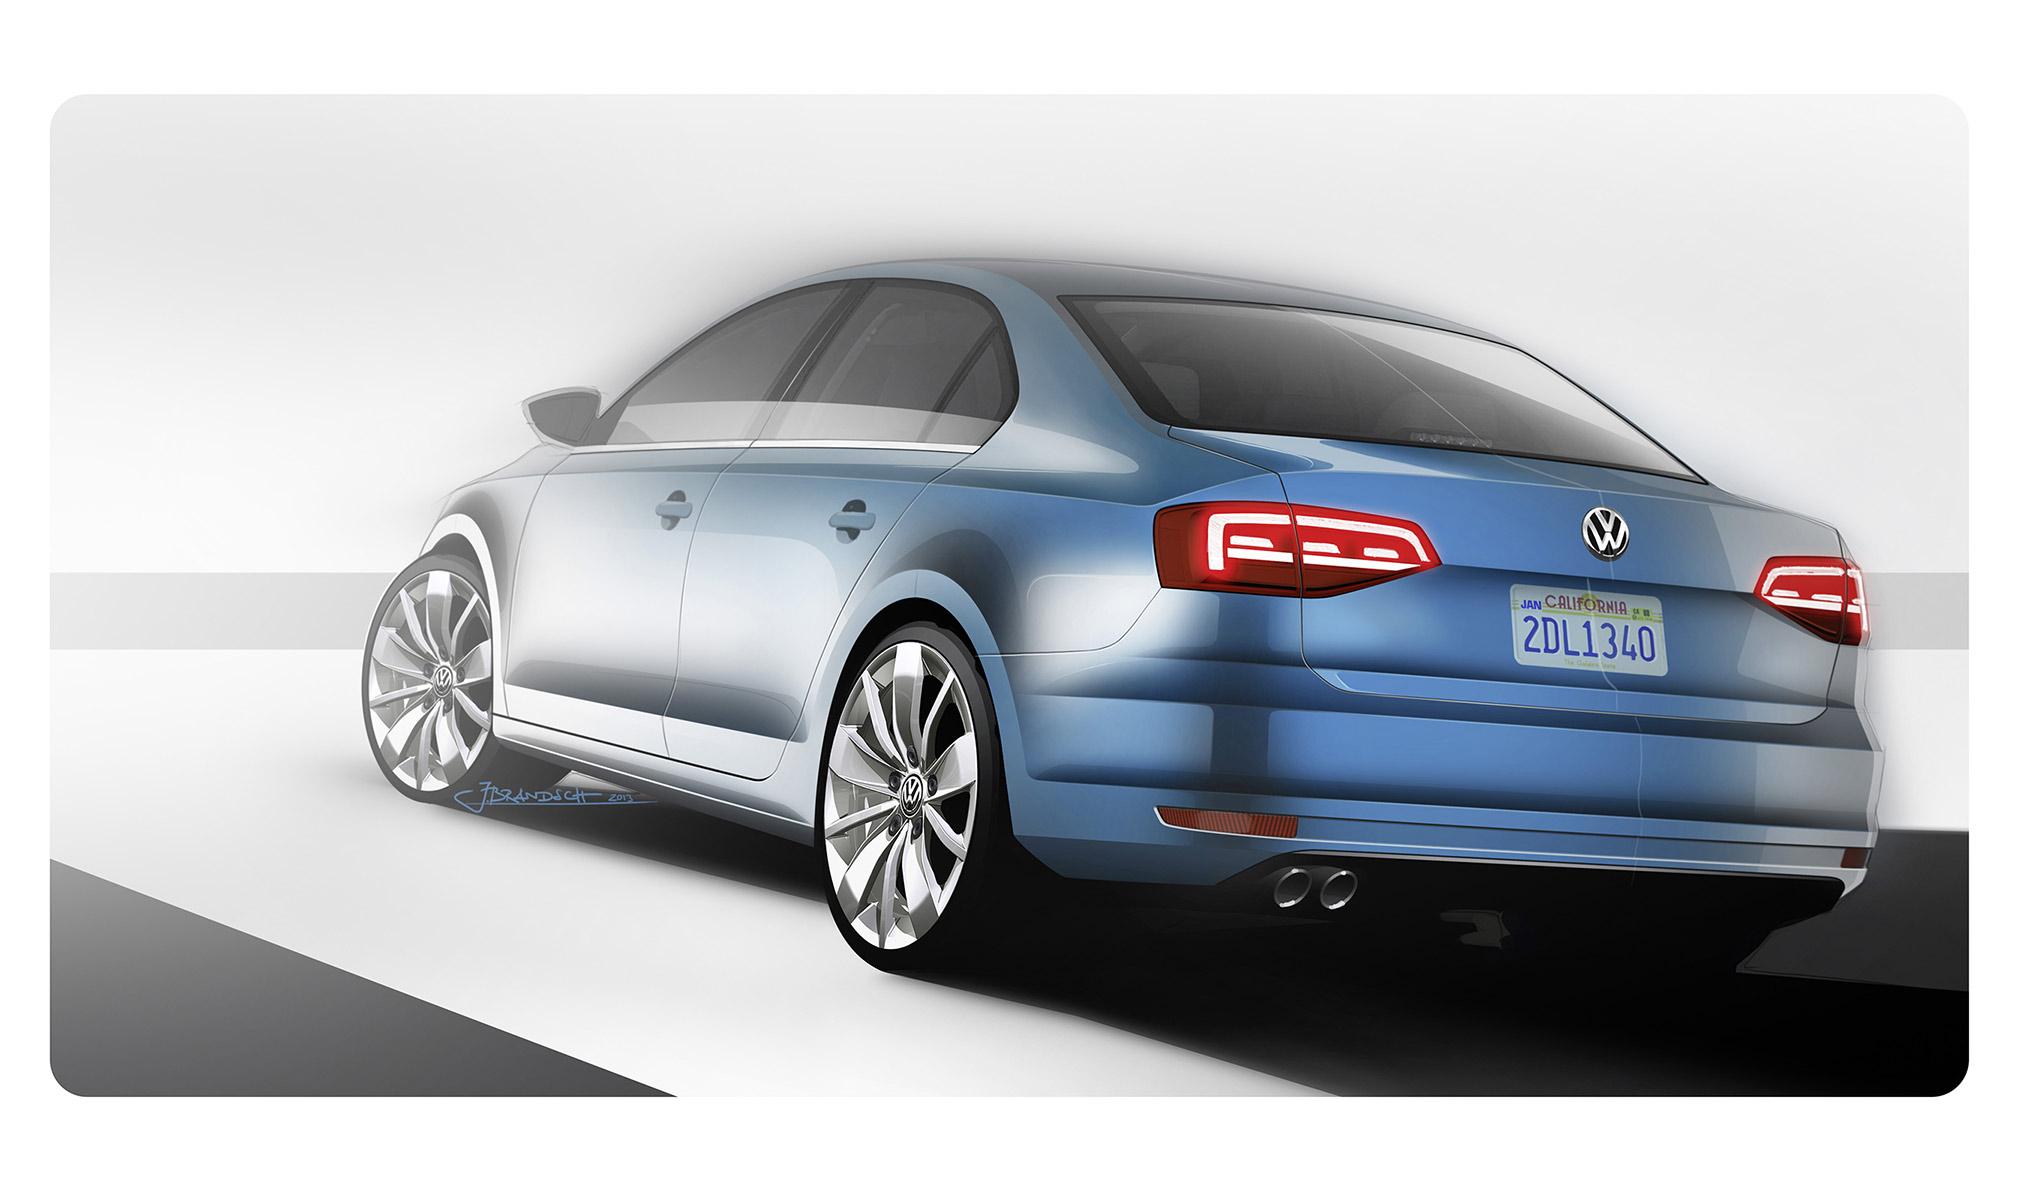 audi s3 sedan looks great with vossen japan cvt wheels. Black Bedroom Furniture Sets. Home Design Ideas